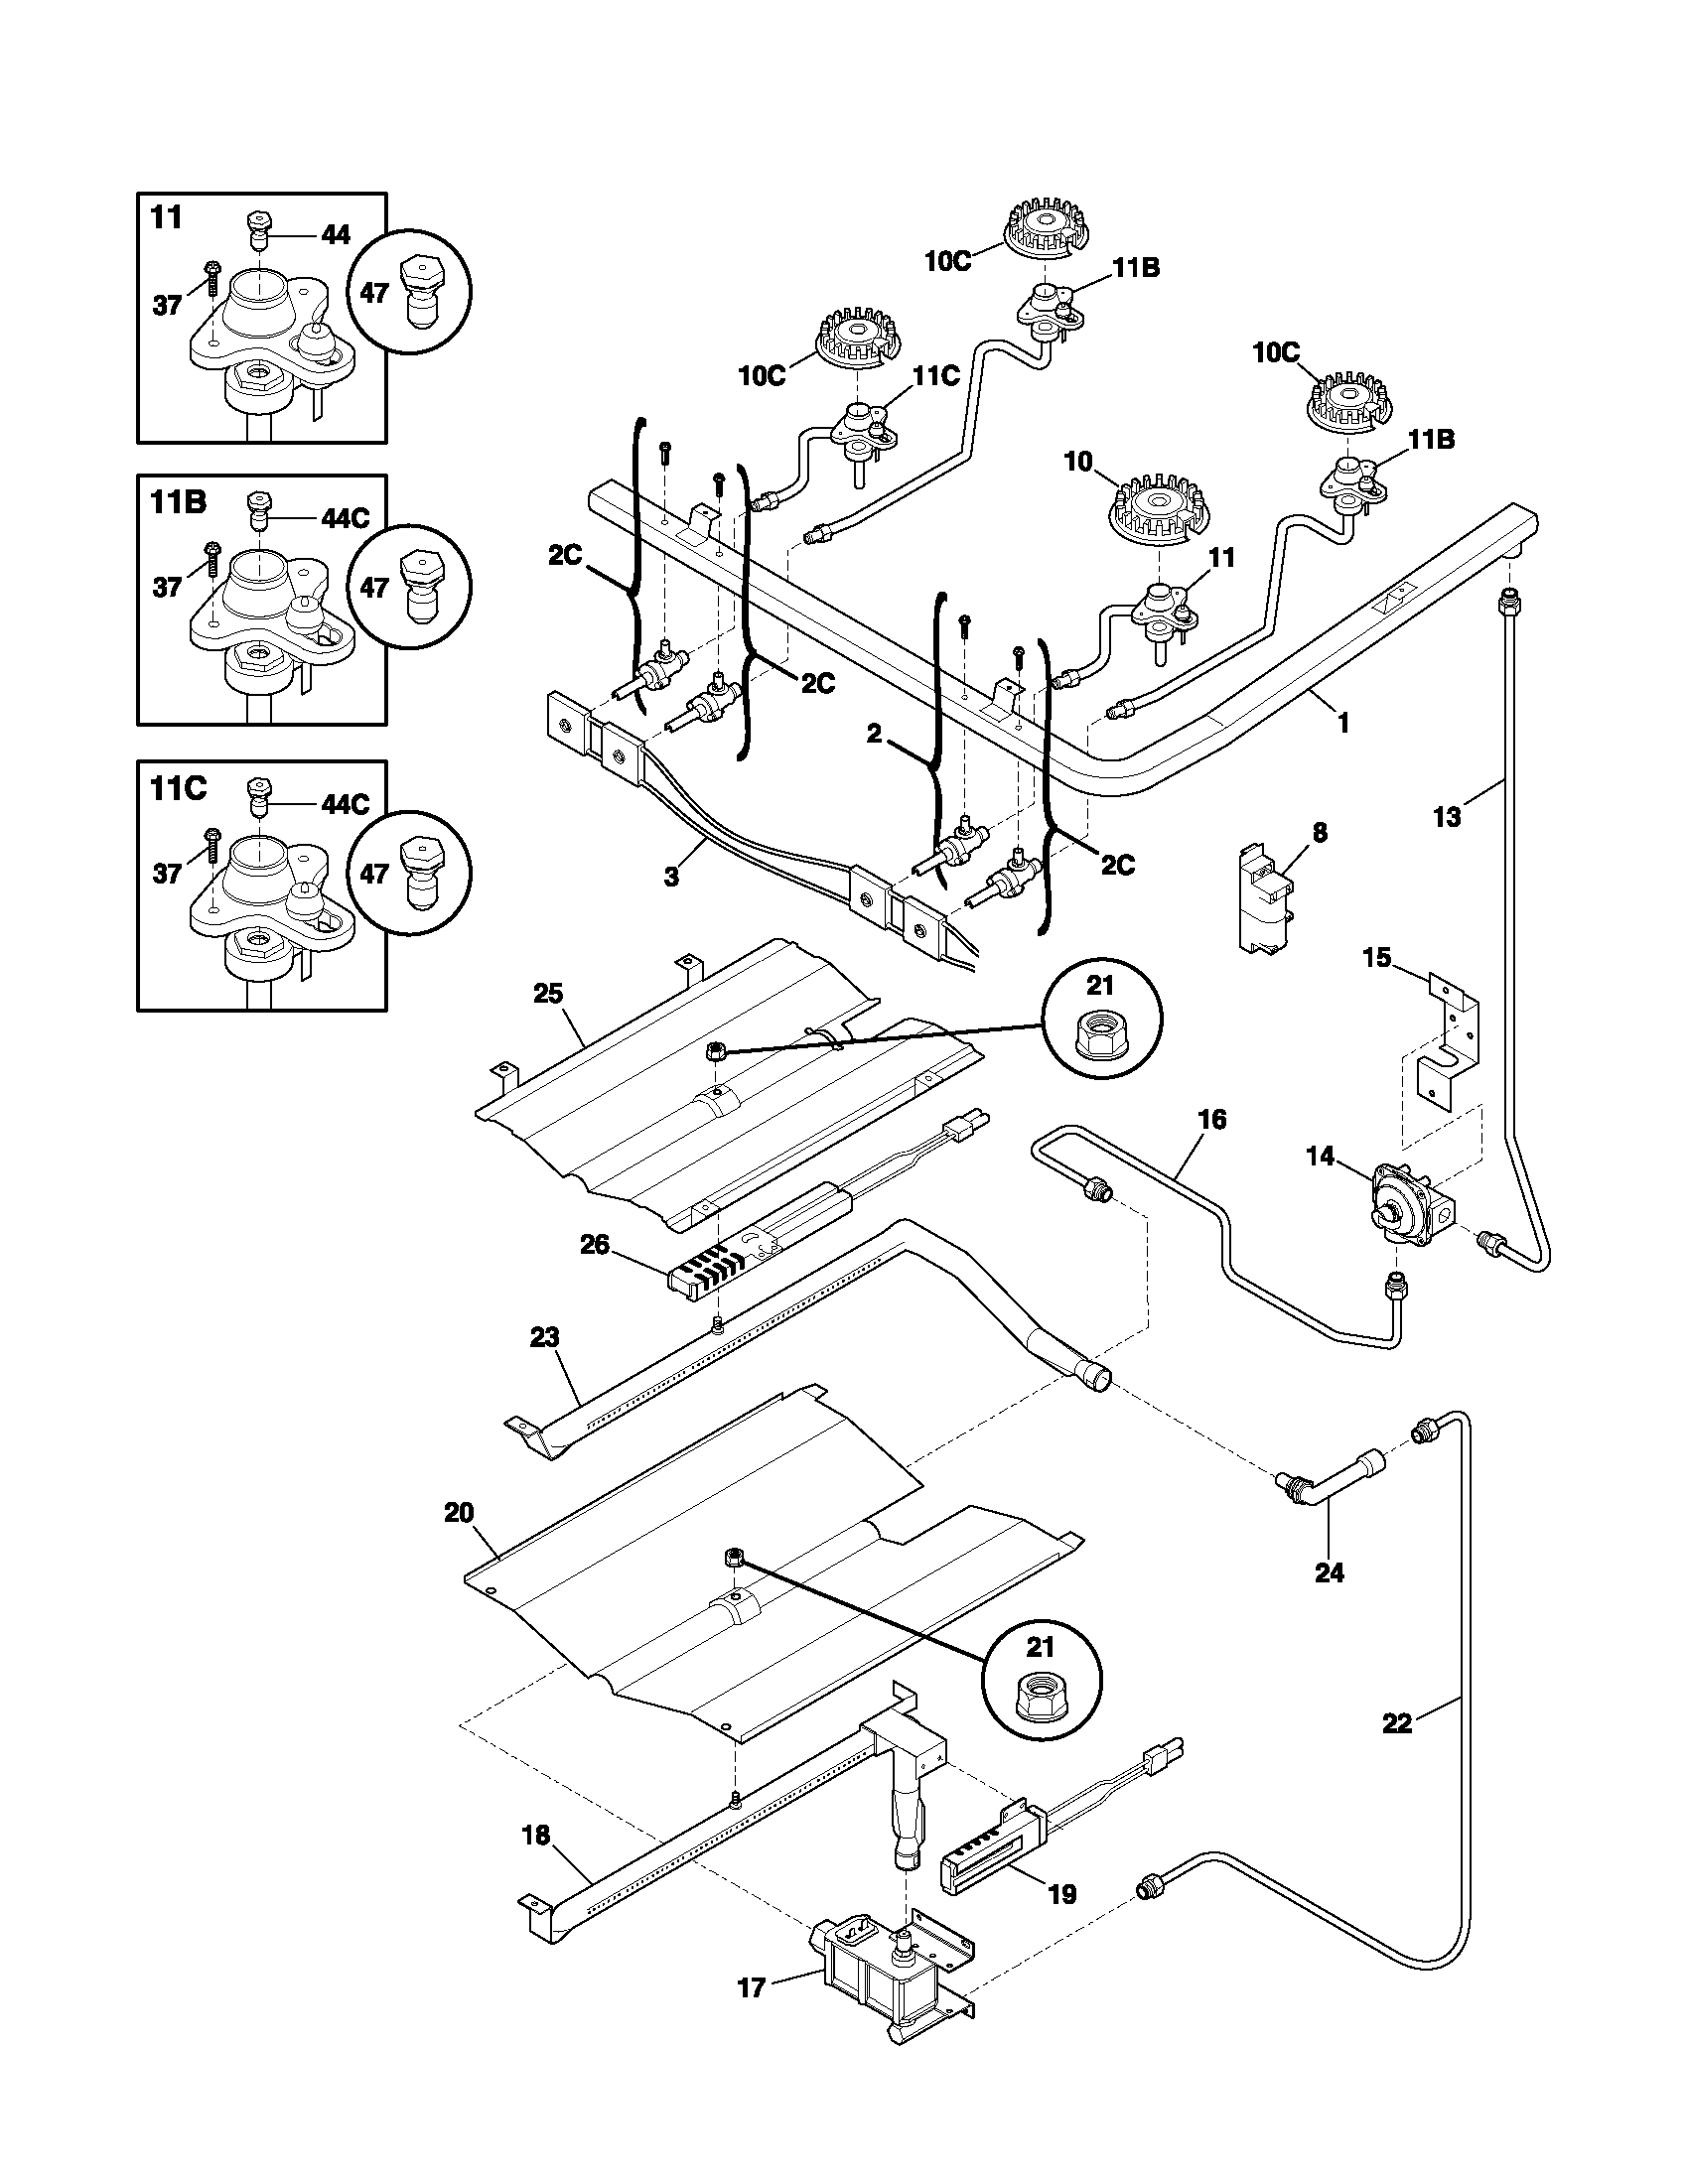 Kitchenaid Dishwasher Wiring Frigidaire Dishwasher Wiring